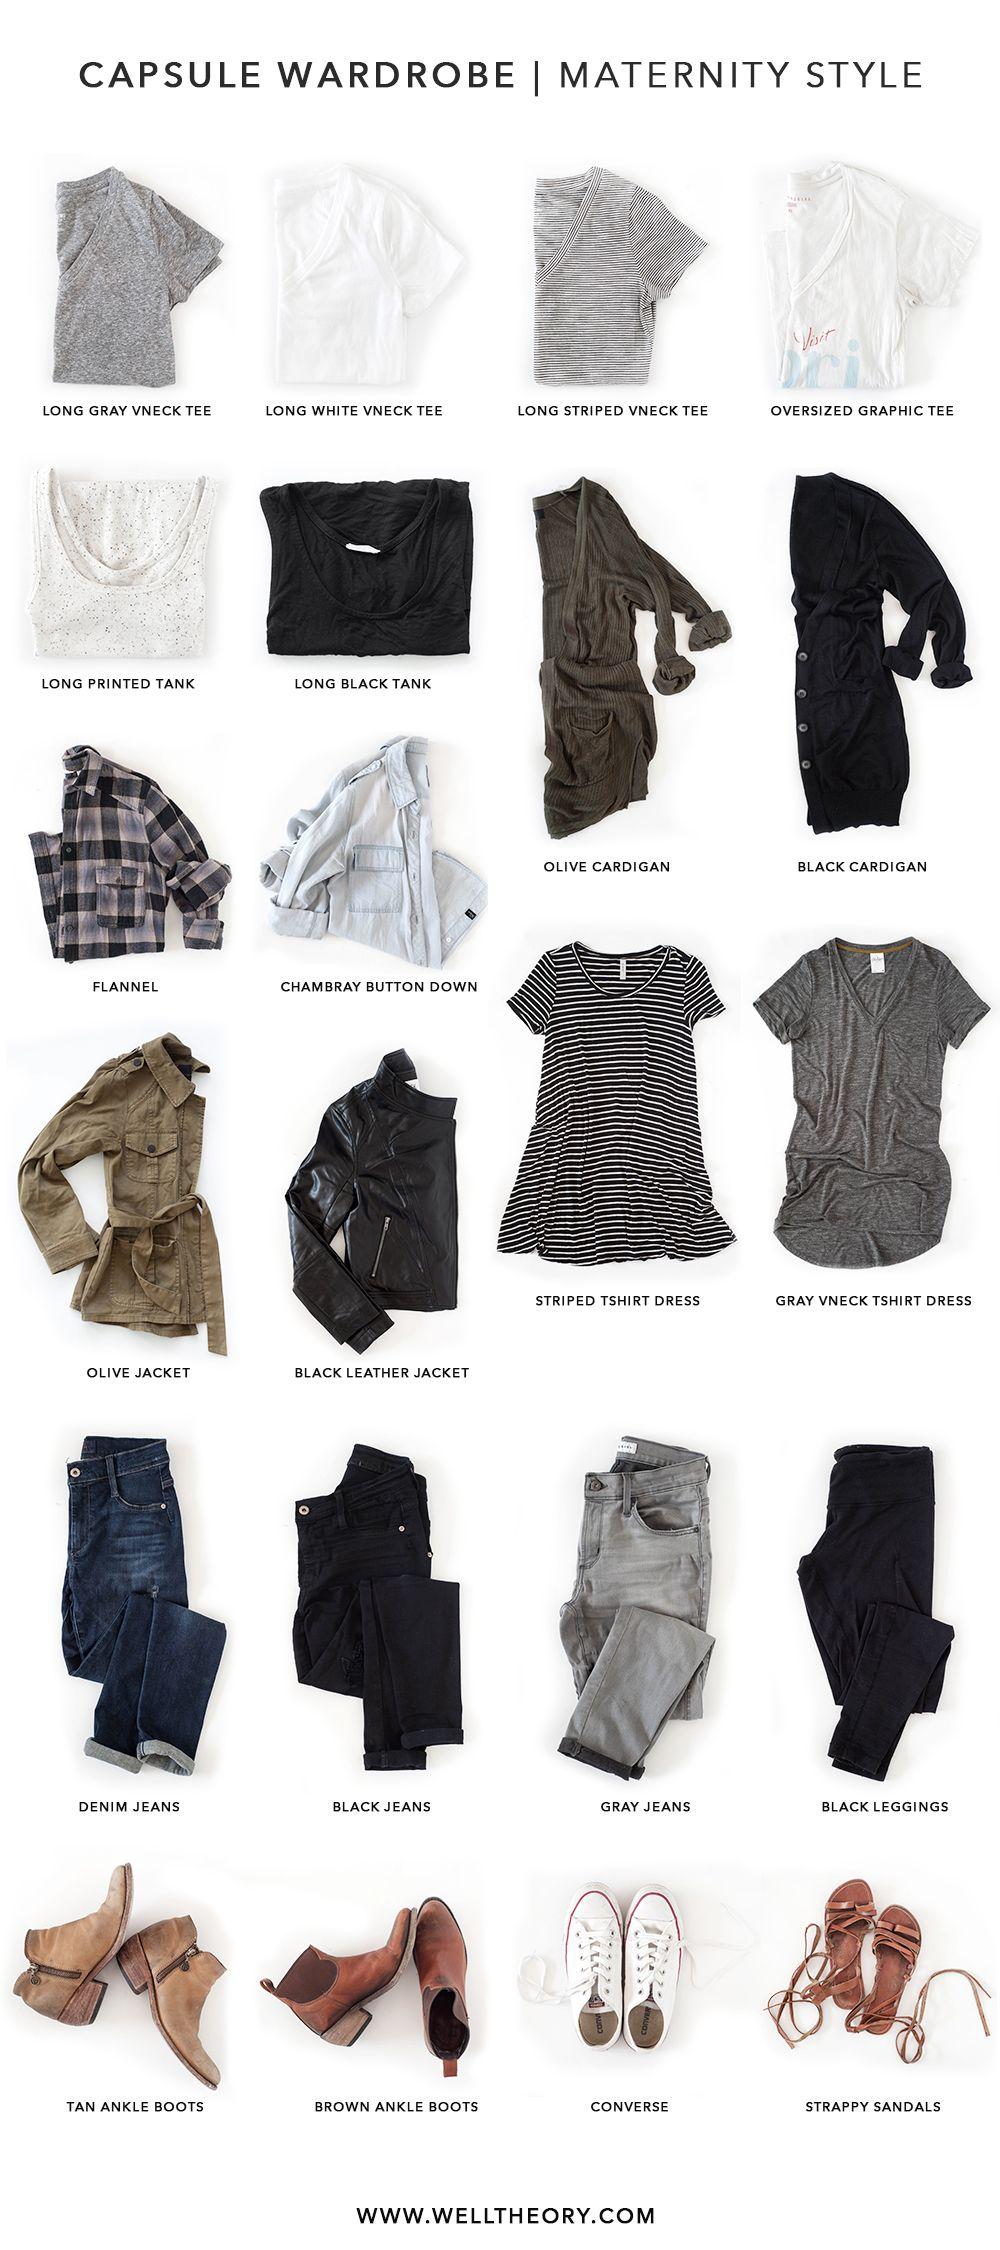 capsule wardrobe maternity style well theory fashion